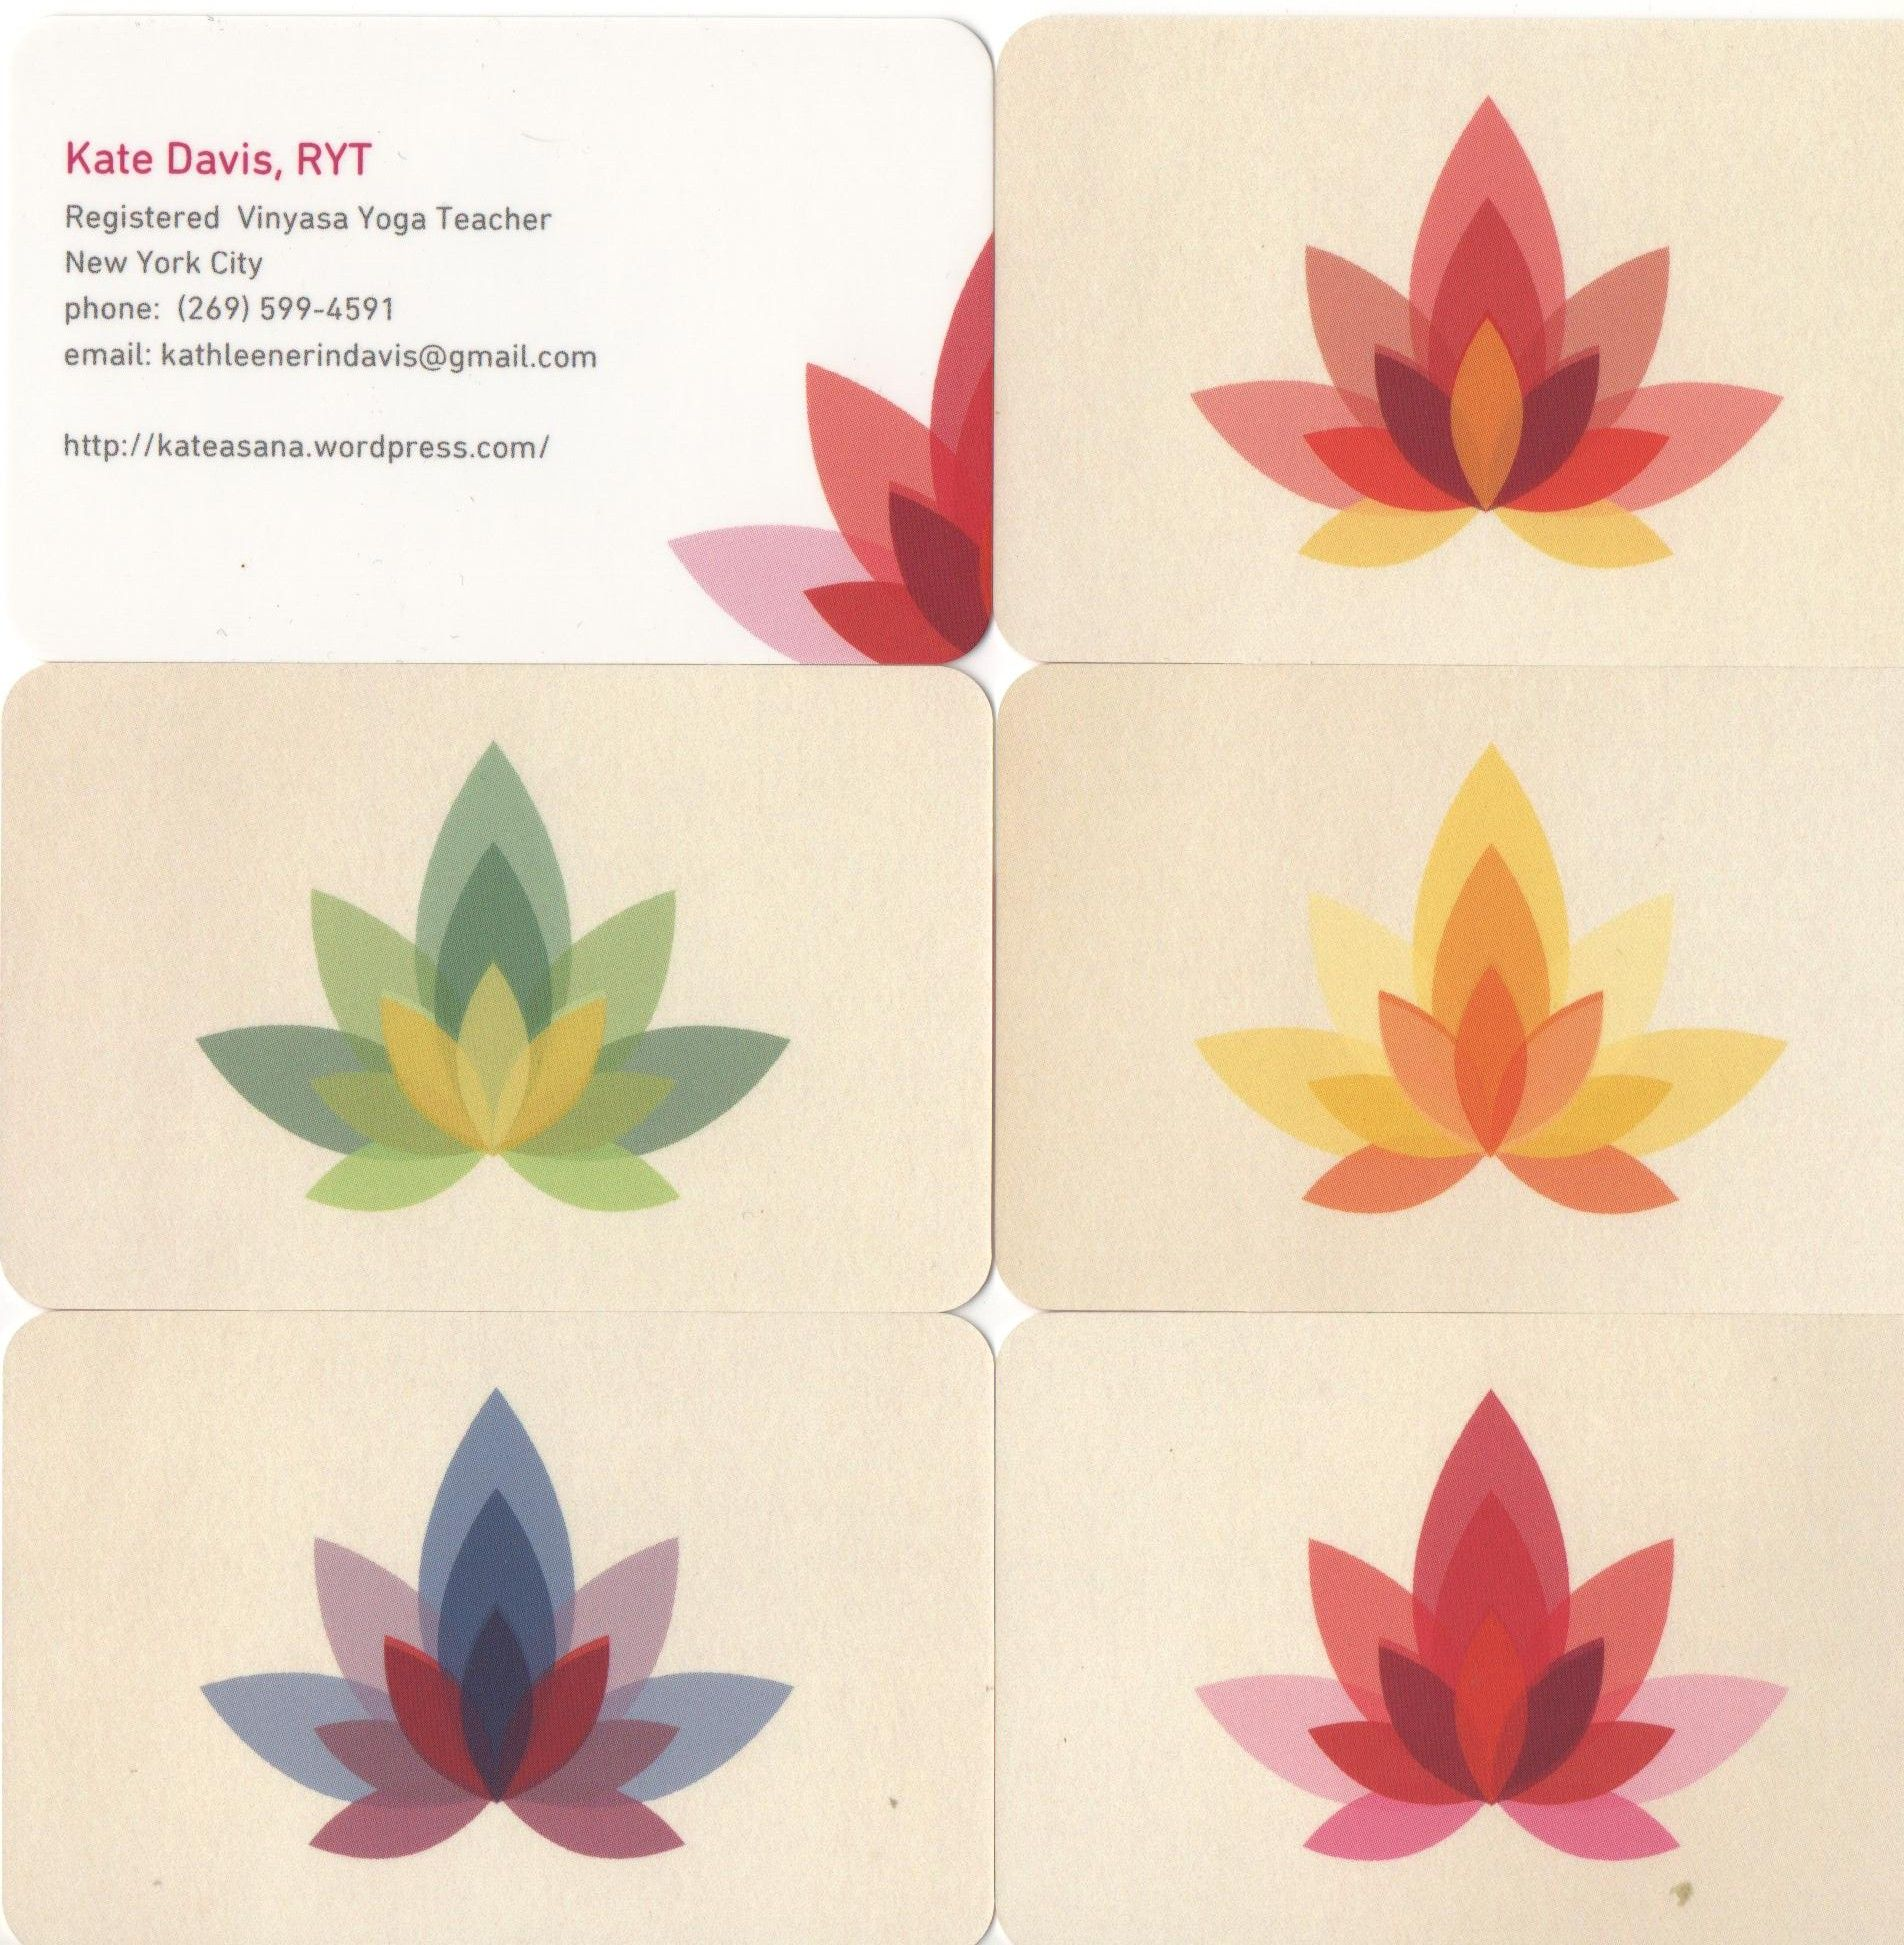 http://kateasana.files.wordpress.com/2011/08/yoga-business-cards.jpg ...